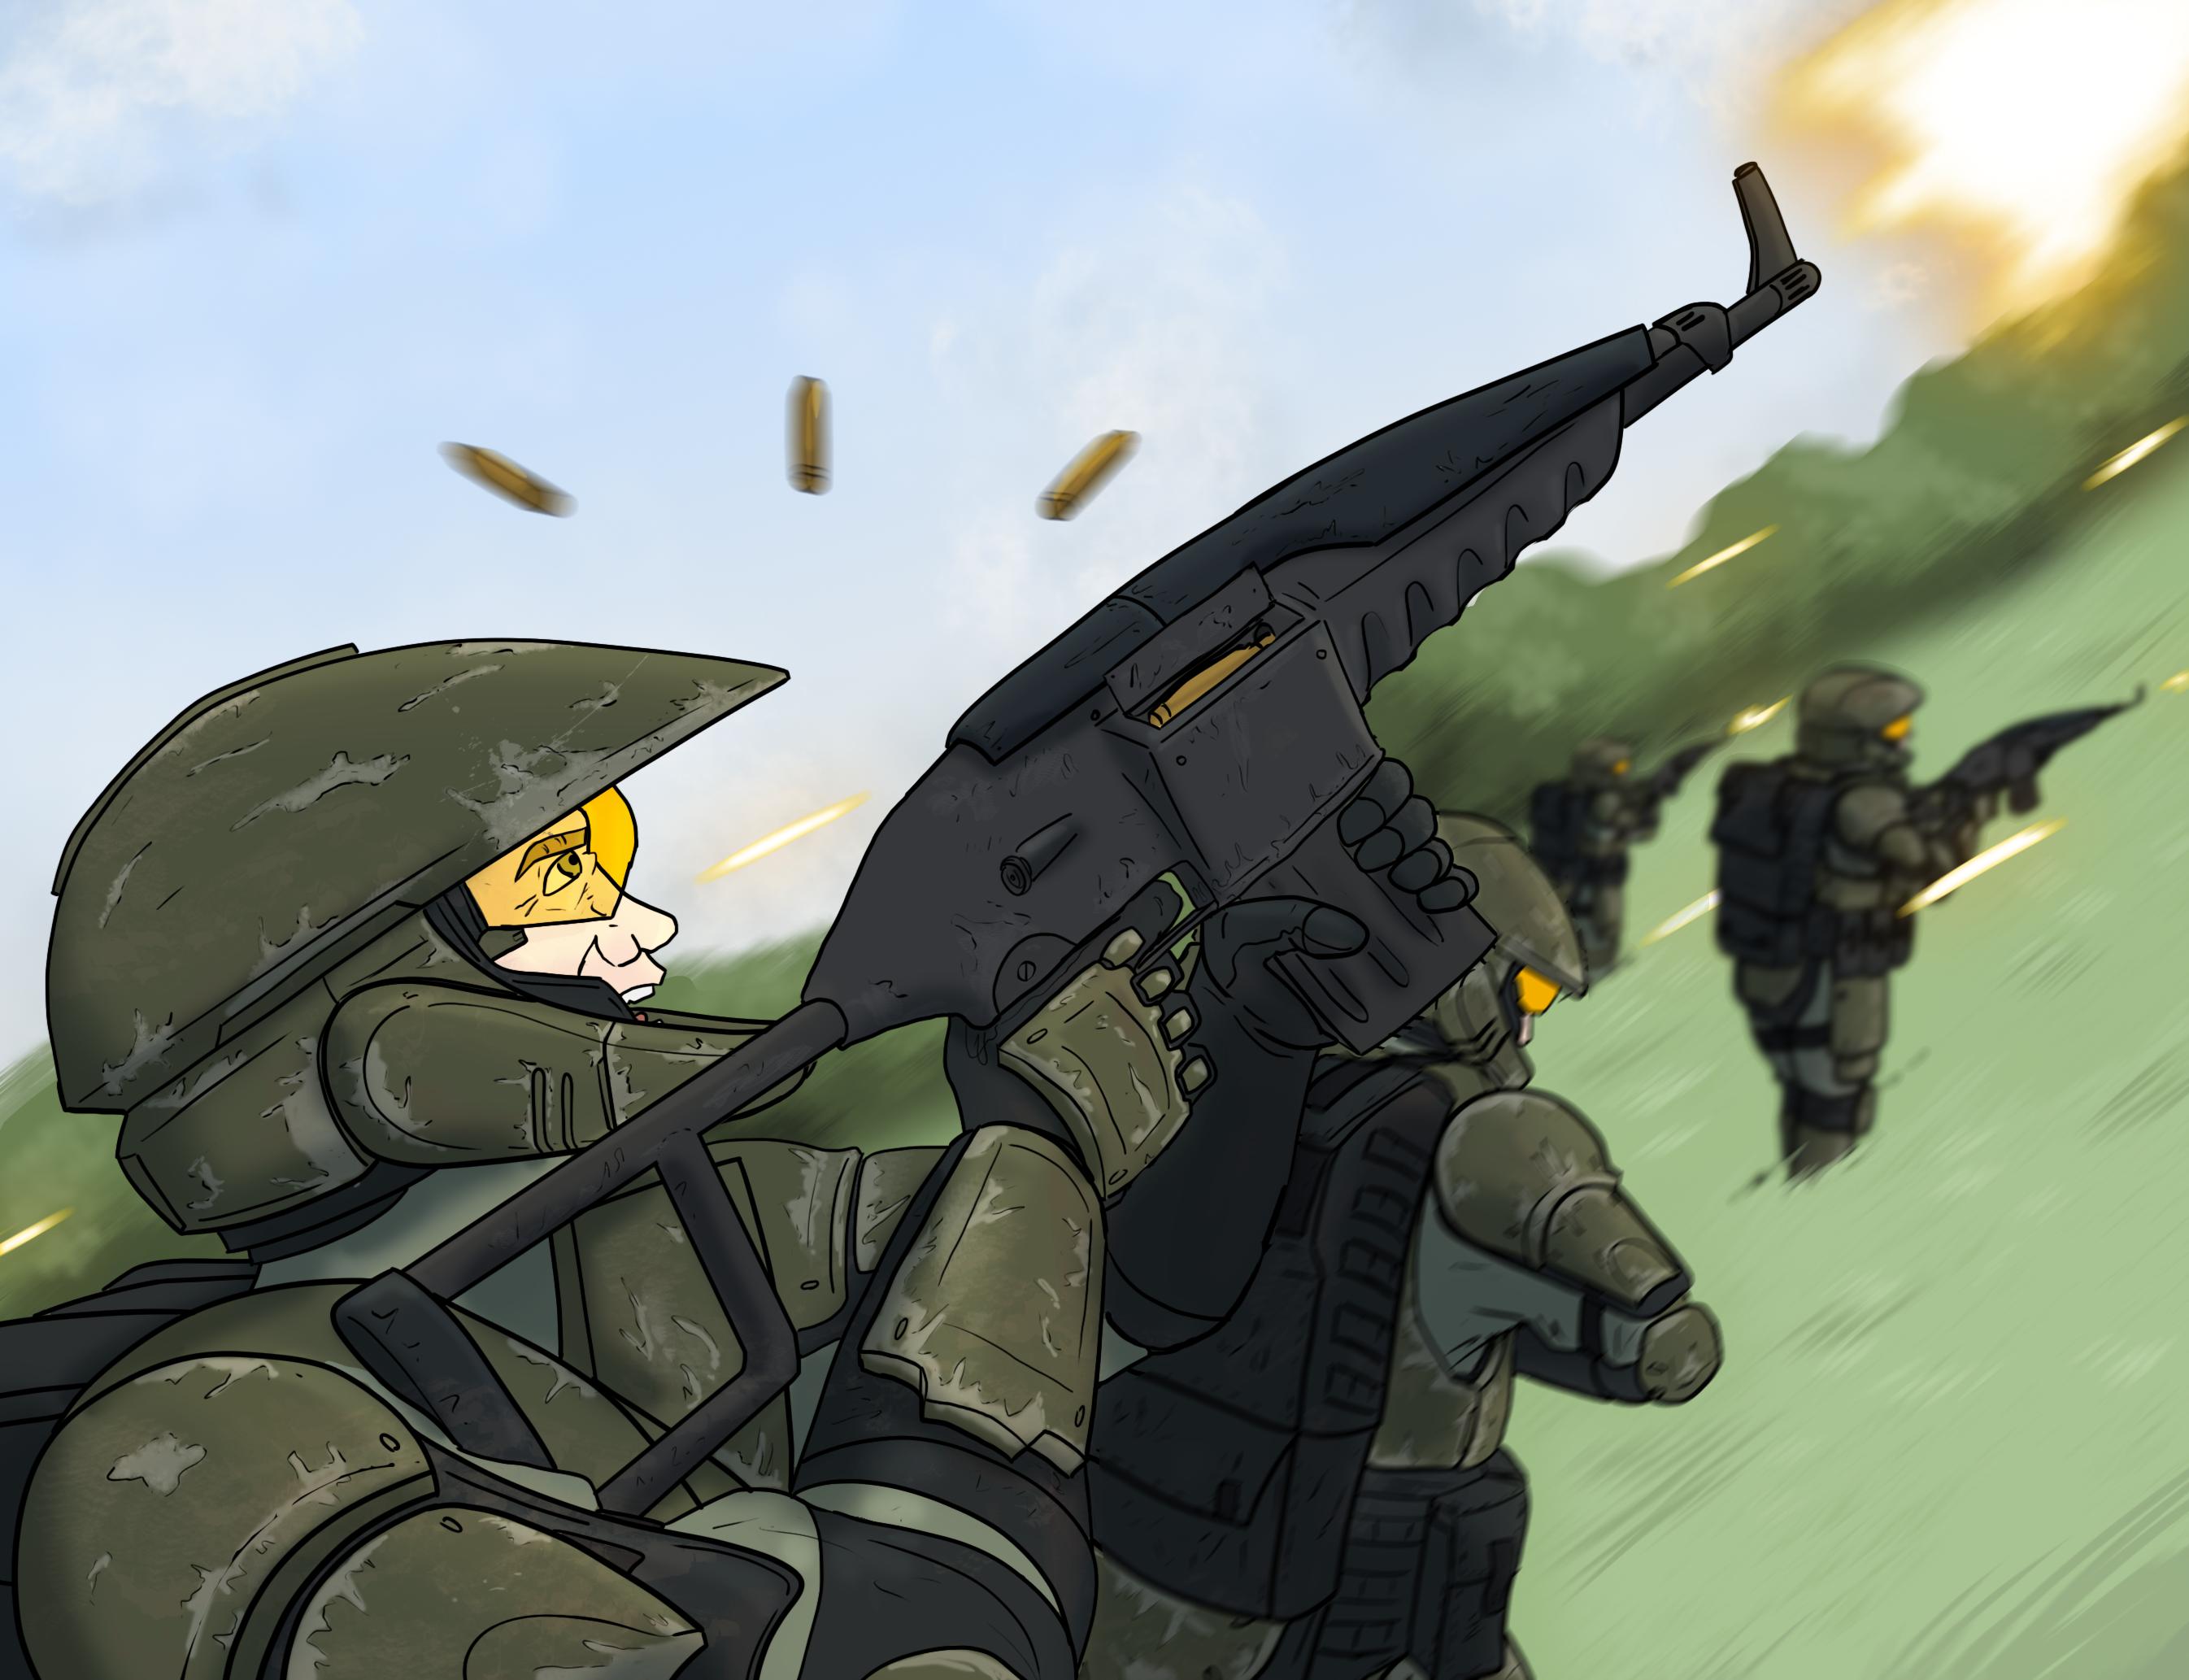 Ambushed on a hill